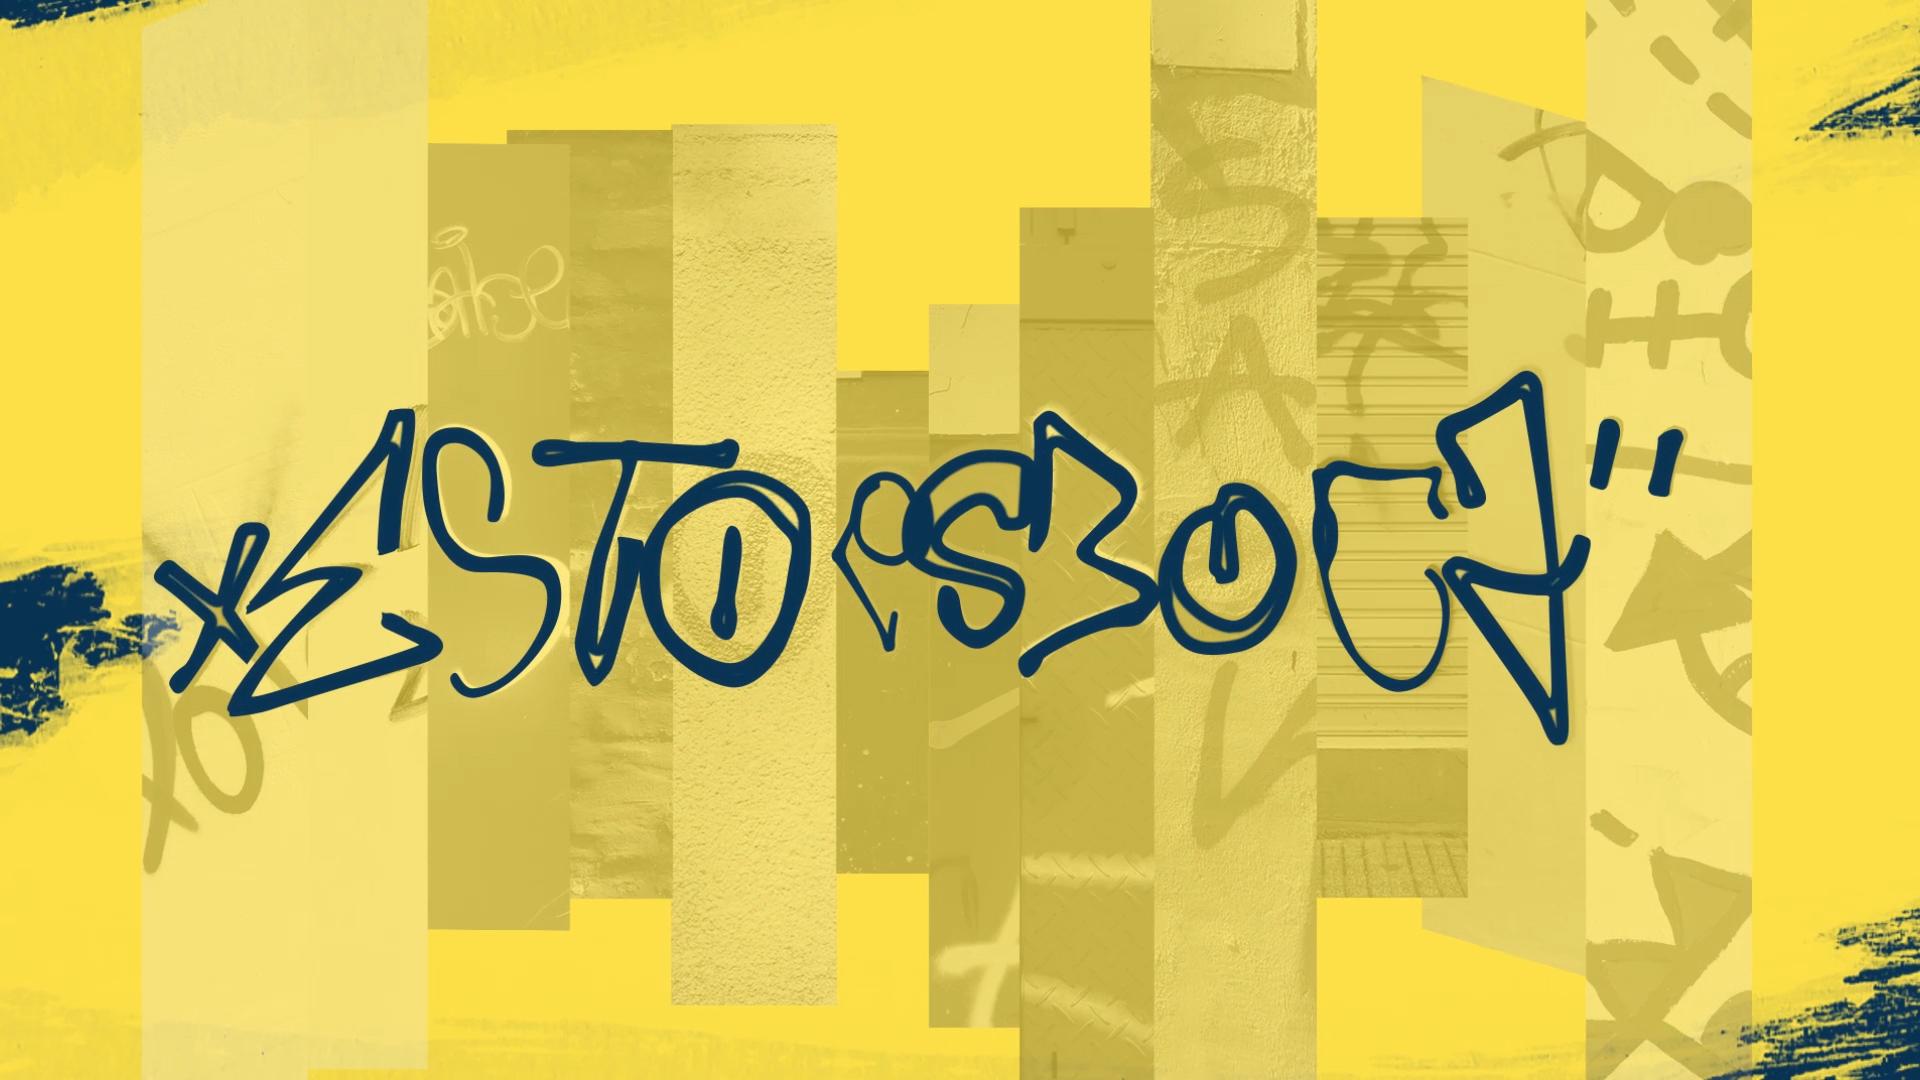 This is Boca Typography_3.jpg